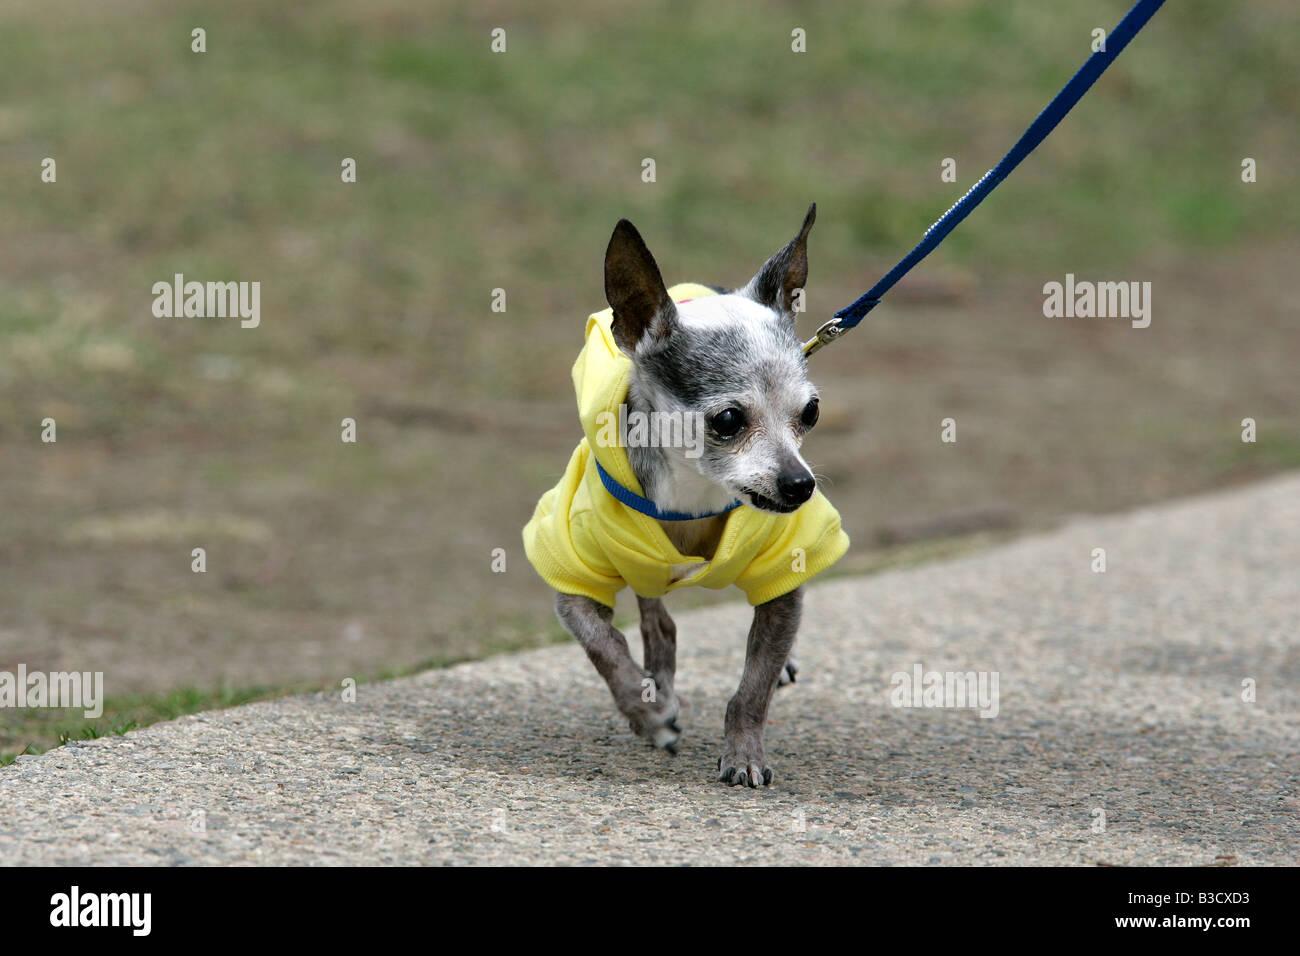 A Chihuahua on a leash - Stock Image